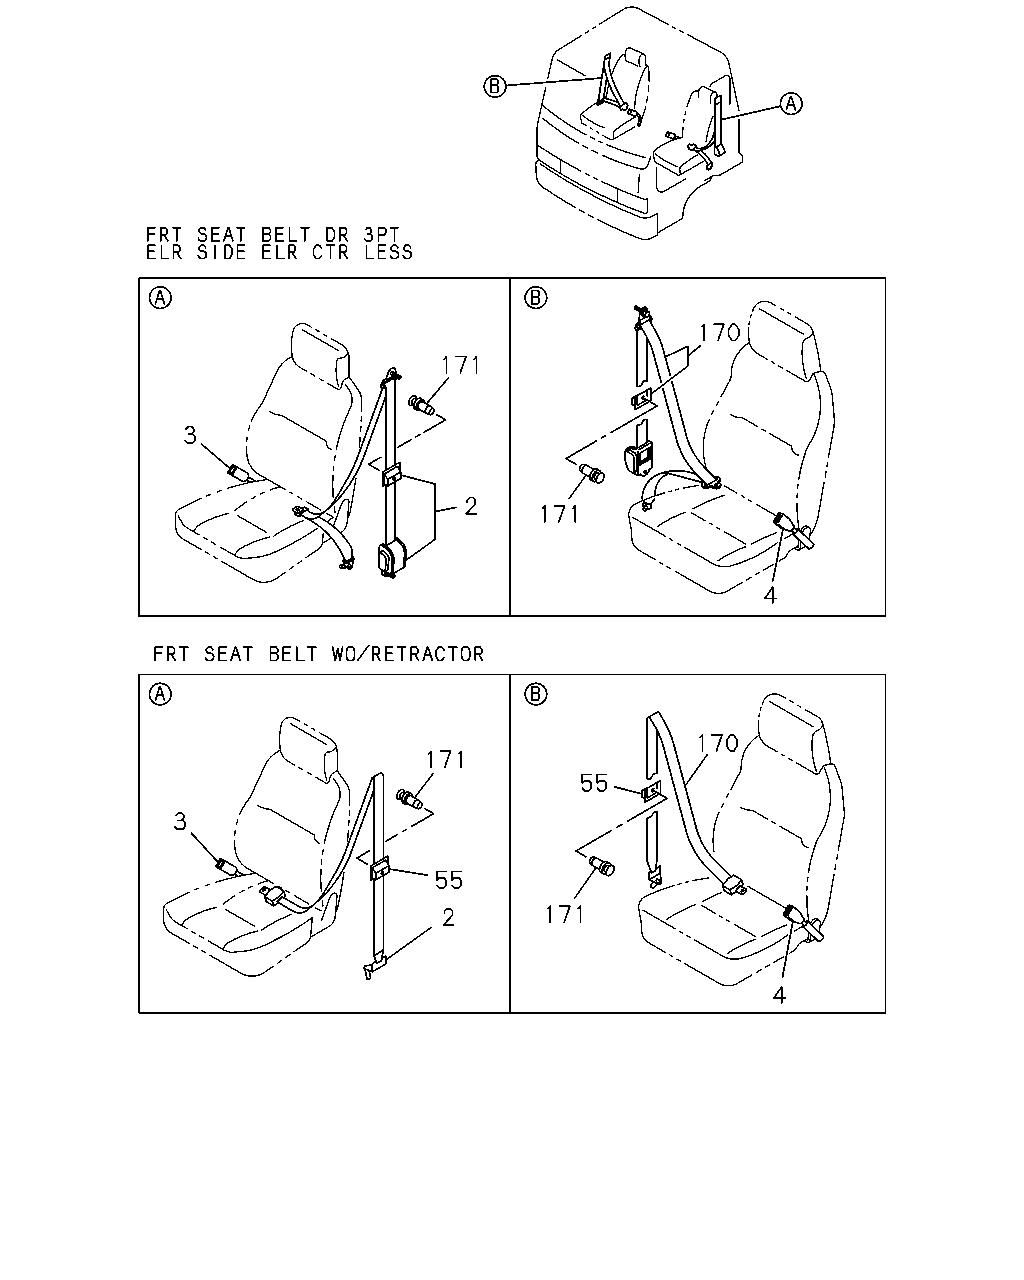 F&G, 11311 - FTS(MIDDLE EAST) 98 - 07, 7 - Interior Trim